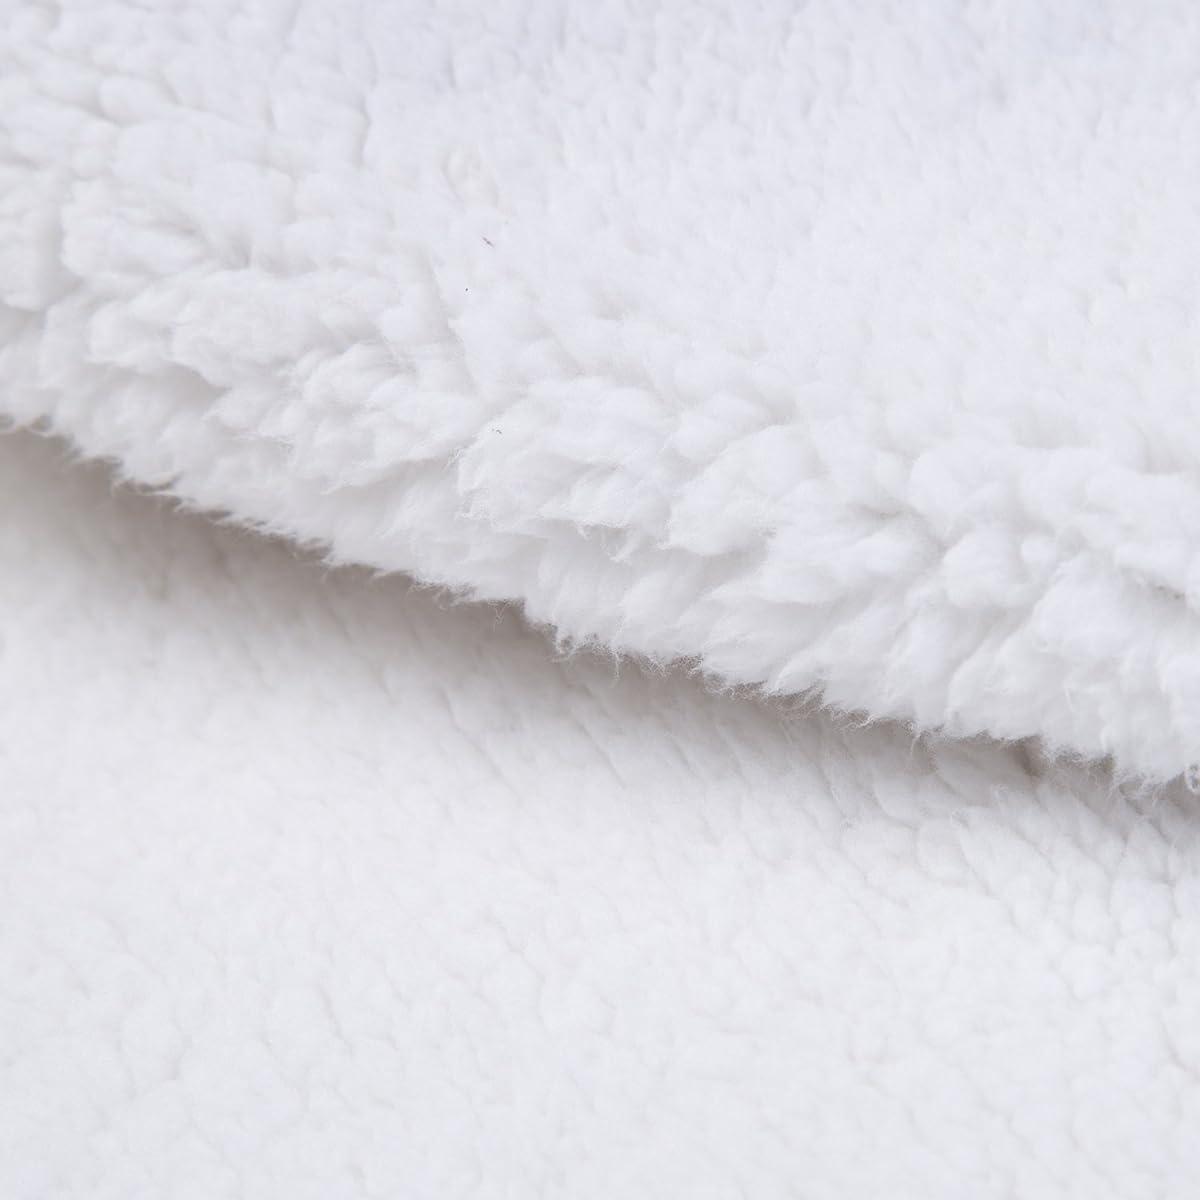 red microfiber sofa dark chocolate leather sherpa throw blanket lt grey 50x60 reversible fuzzy ...